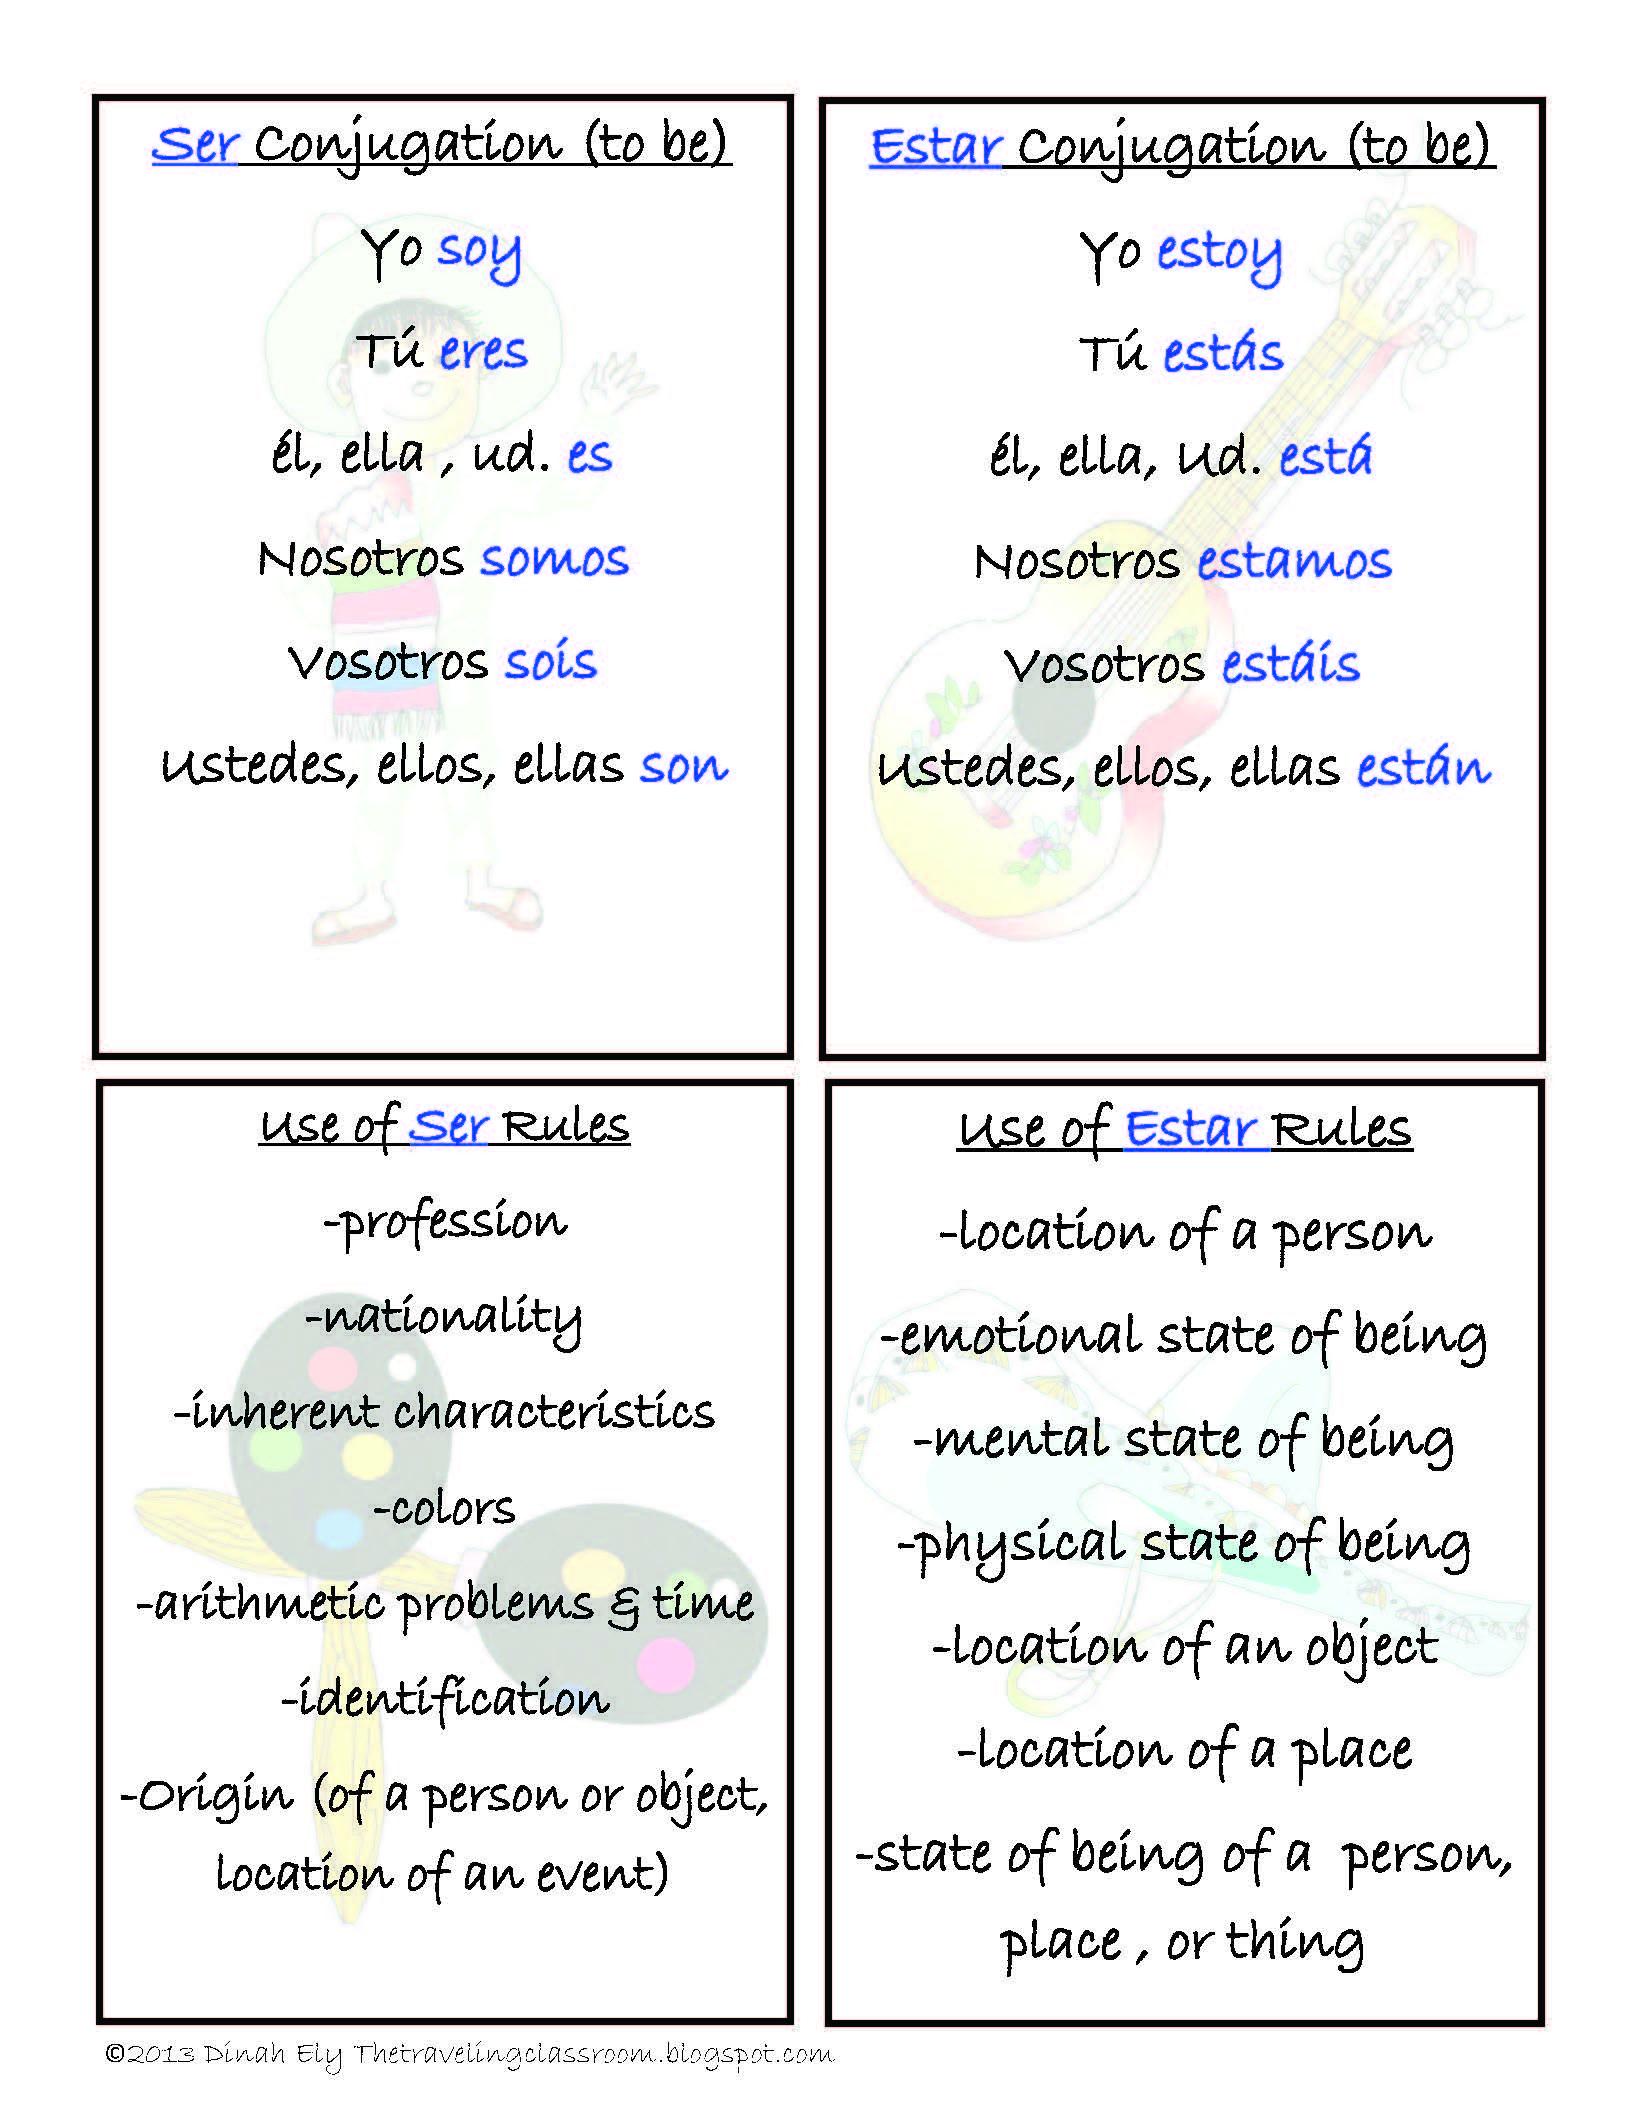 Free Spanish Verbs Ser Estar Tener Vivir Comer Tomar Spanish Language Learning Spanish Flashcards Spanish Teaching Resources